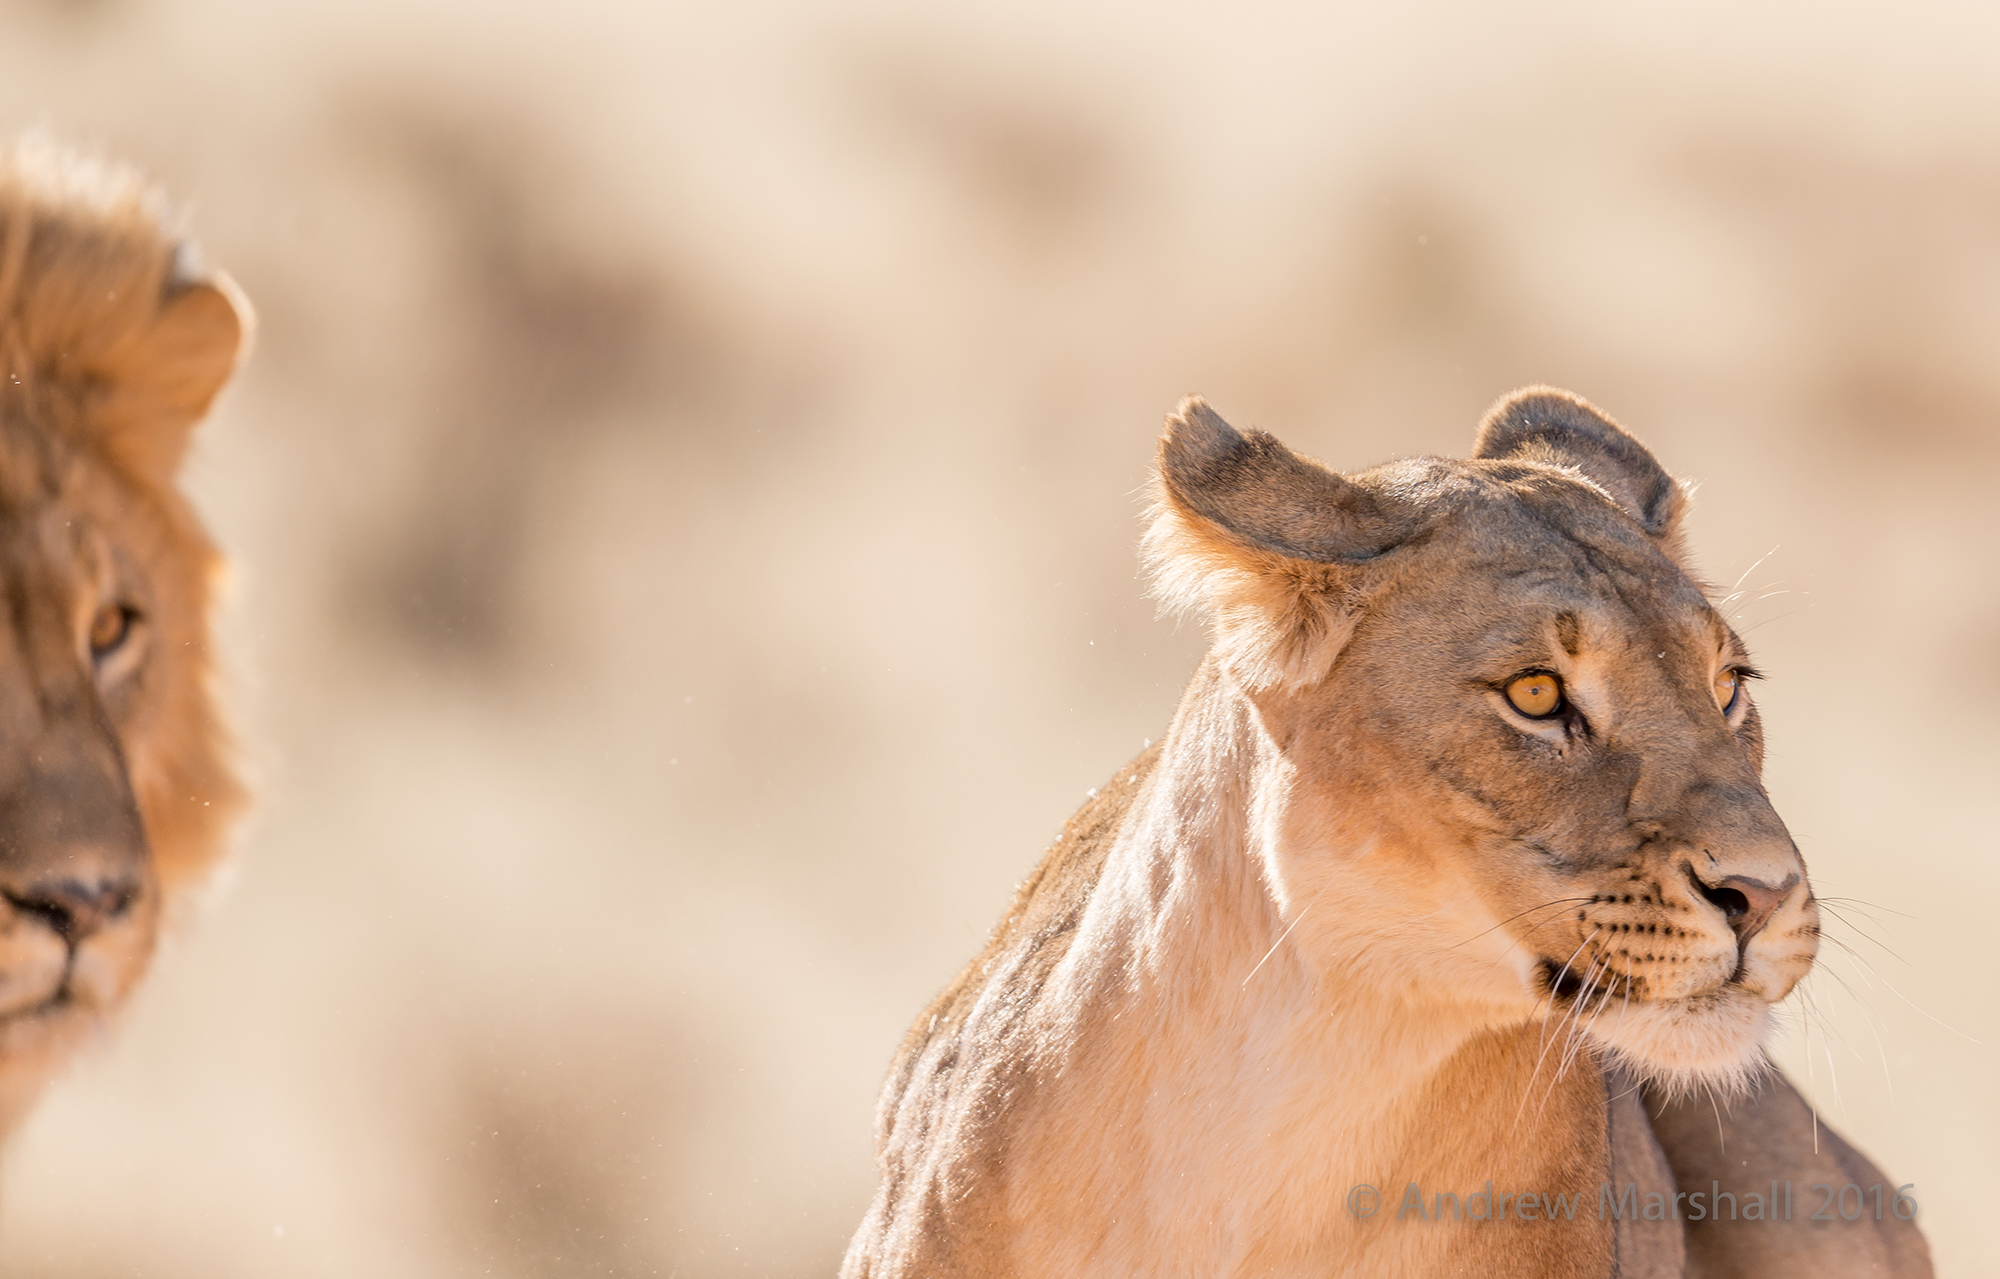 Black-maned lions of the Kalahari, Kgalagadi Transfrontier Park. Nikon D800E, Nikkor 500mm f/4 at 500mm, ISO 360, 1/1000s at f/5.6. Handheld. © Andrew Marshall.